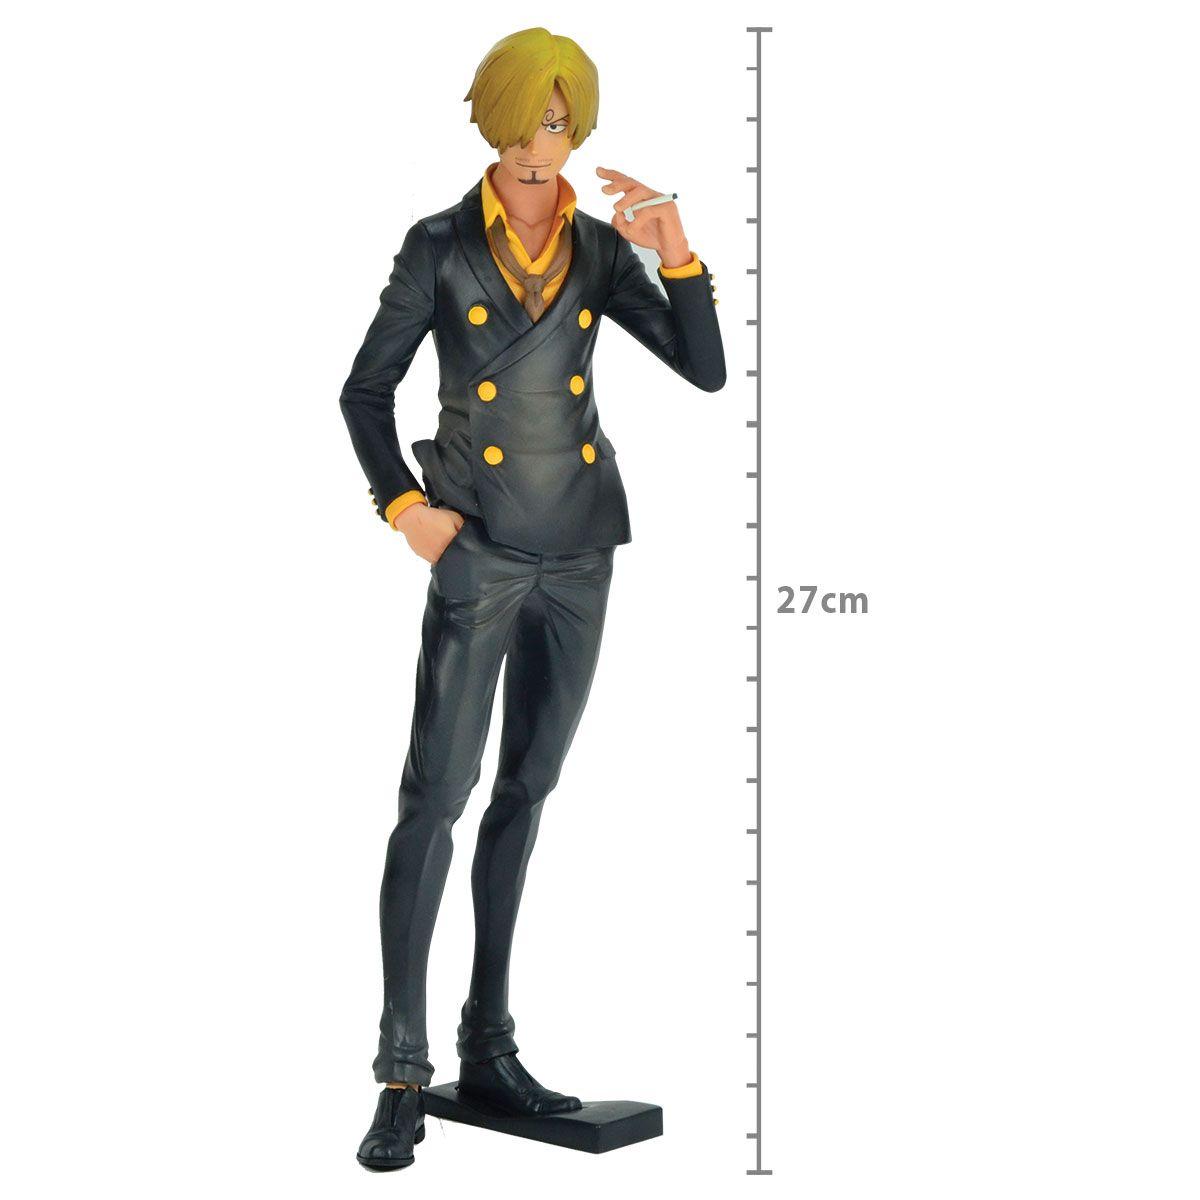 One Piece - Vinsmoke Sanji - Grandista - The Grandline Men - Bandai Banpresto